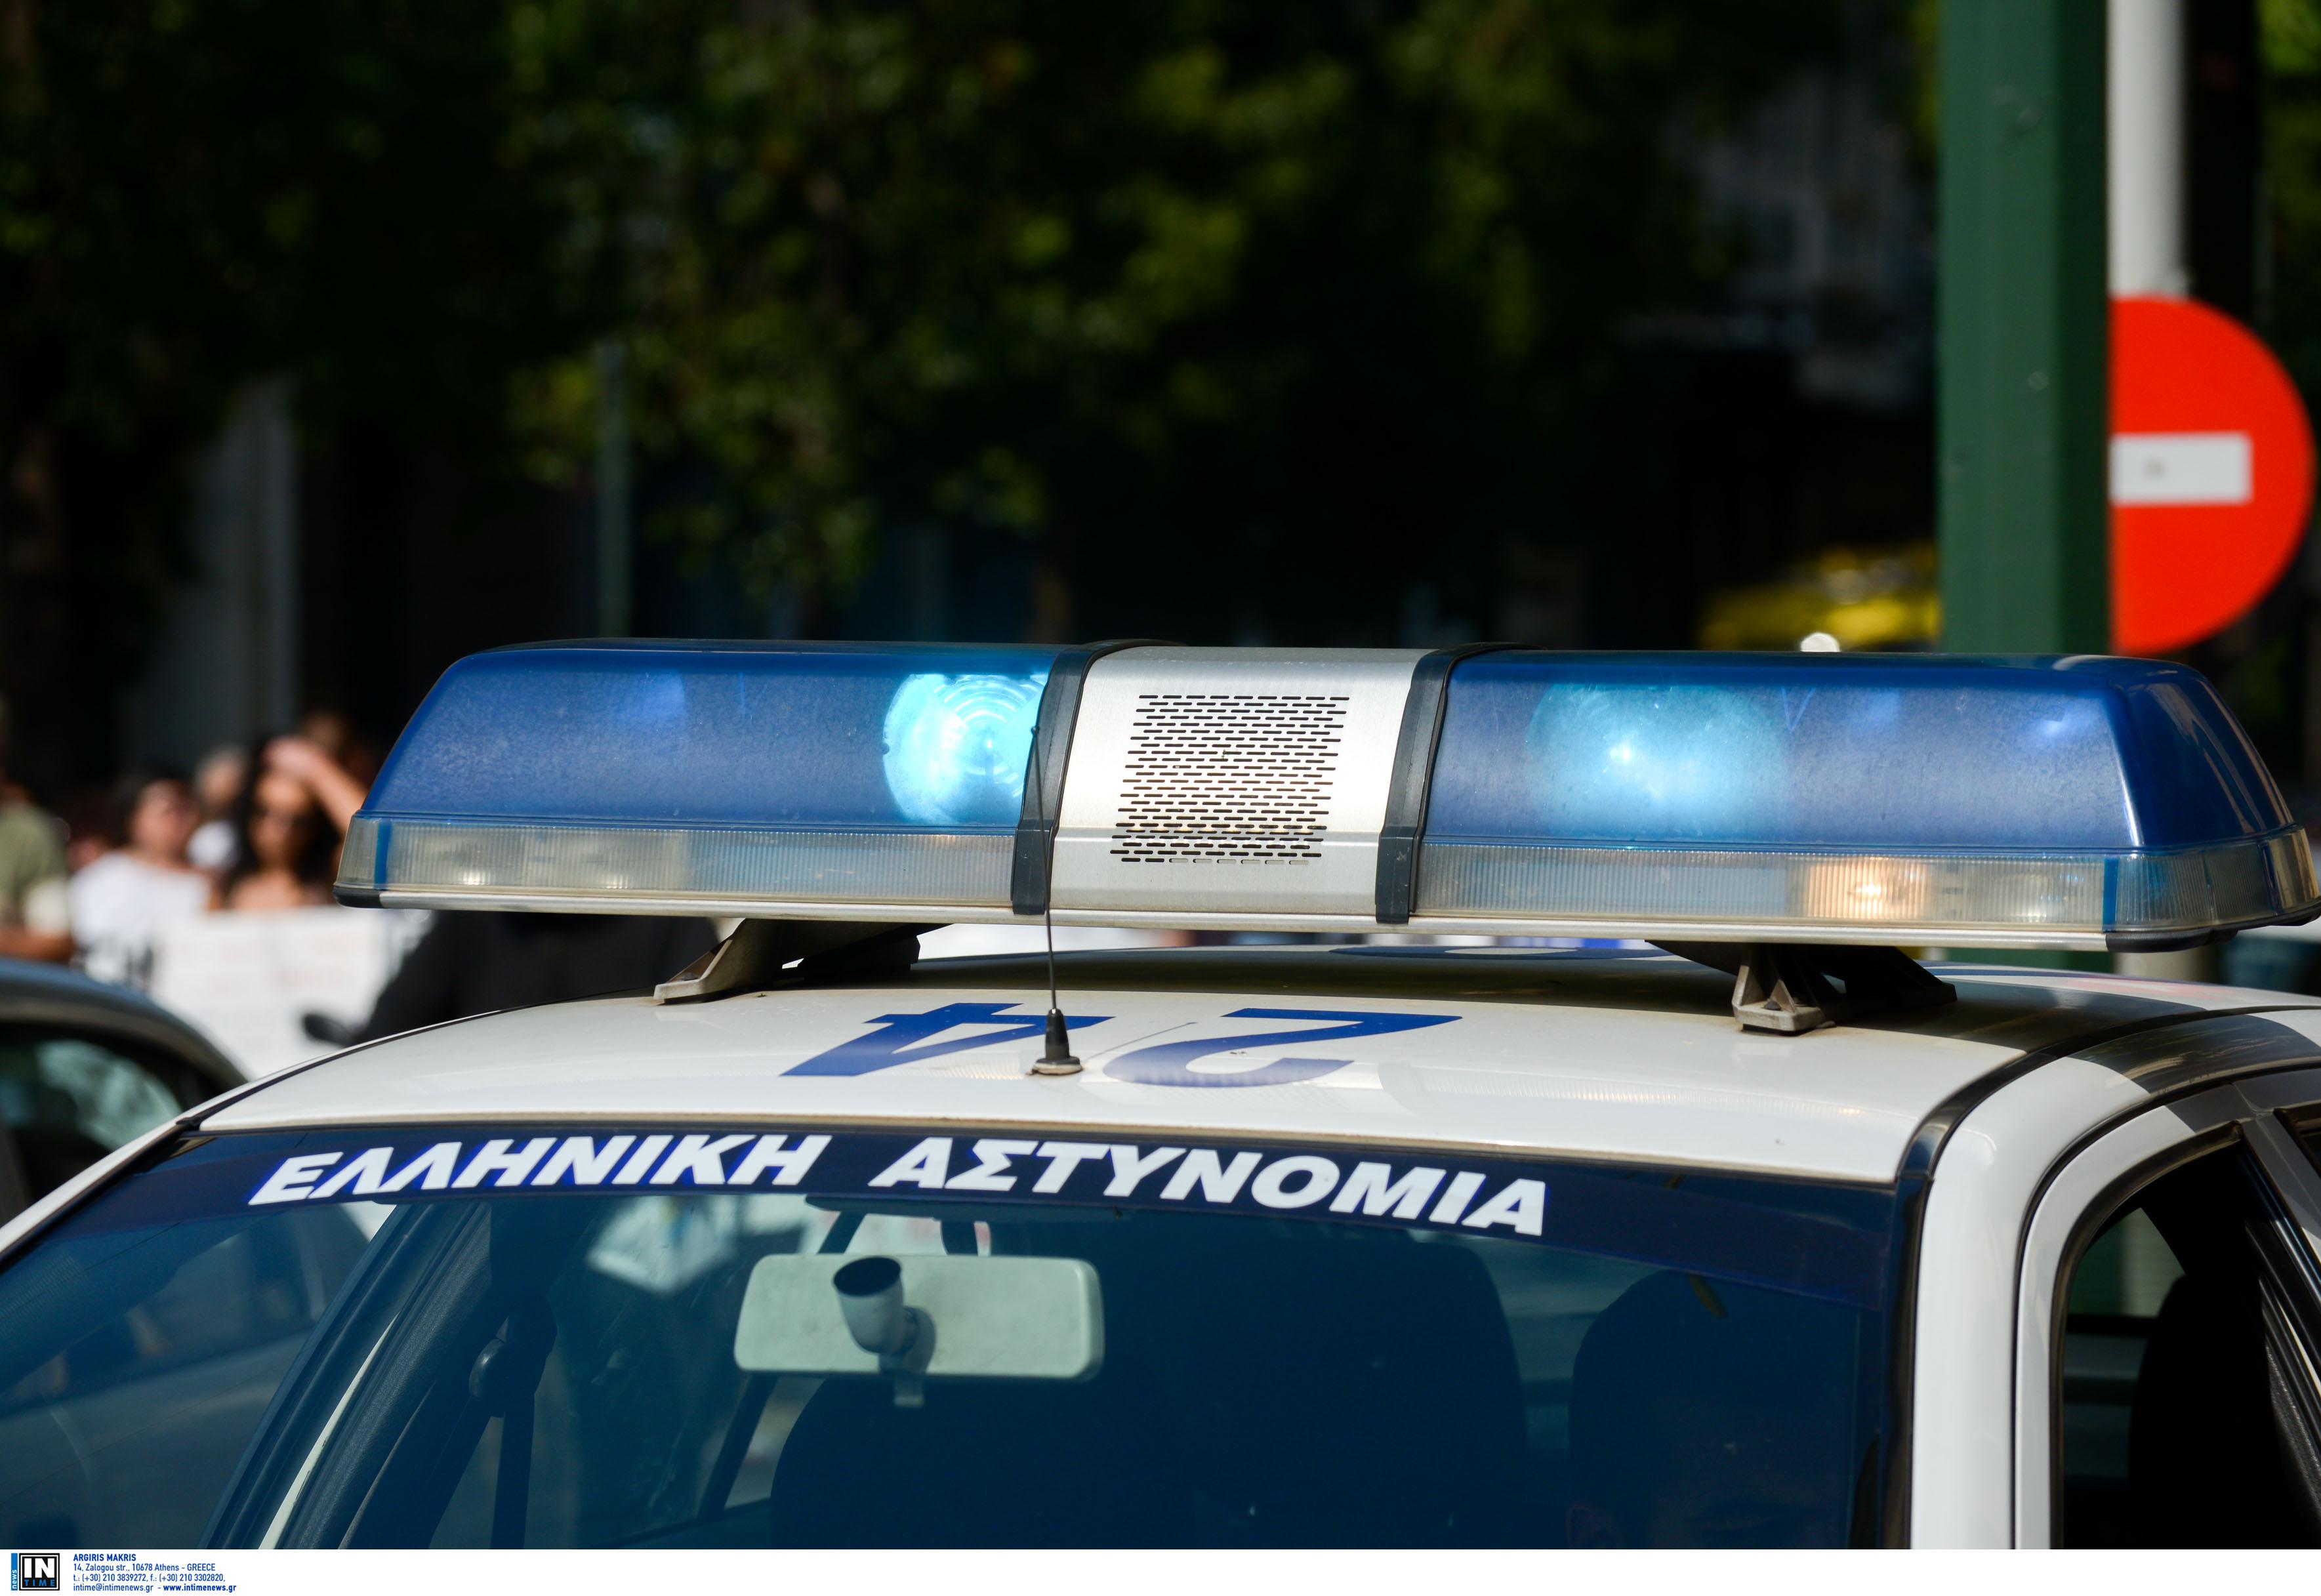 Xάραξαν με μαχαίρι προσφυγόπουλο στη Θεσσαλονίκη! «Αν ξανάρθεις στο σχολείο, θα πάθεις χειρότερα»